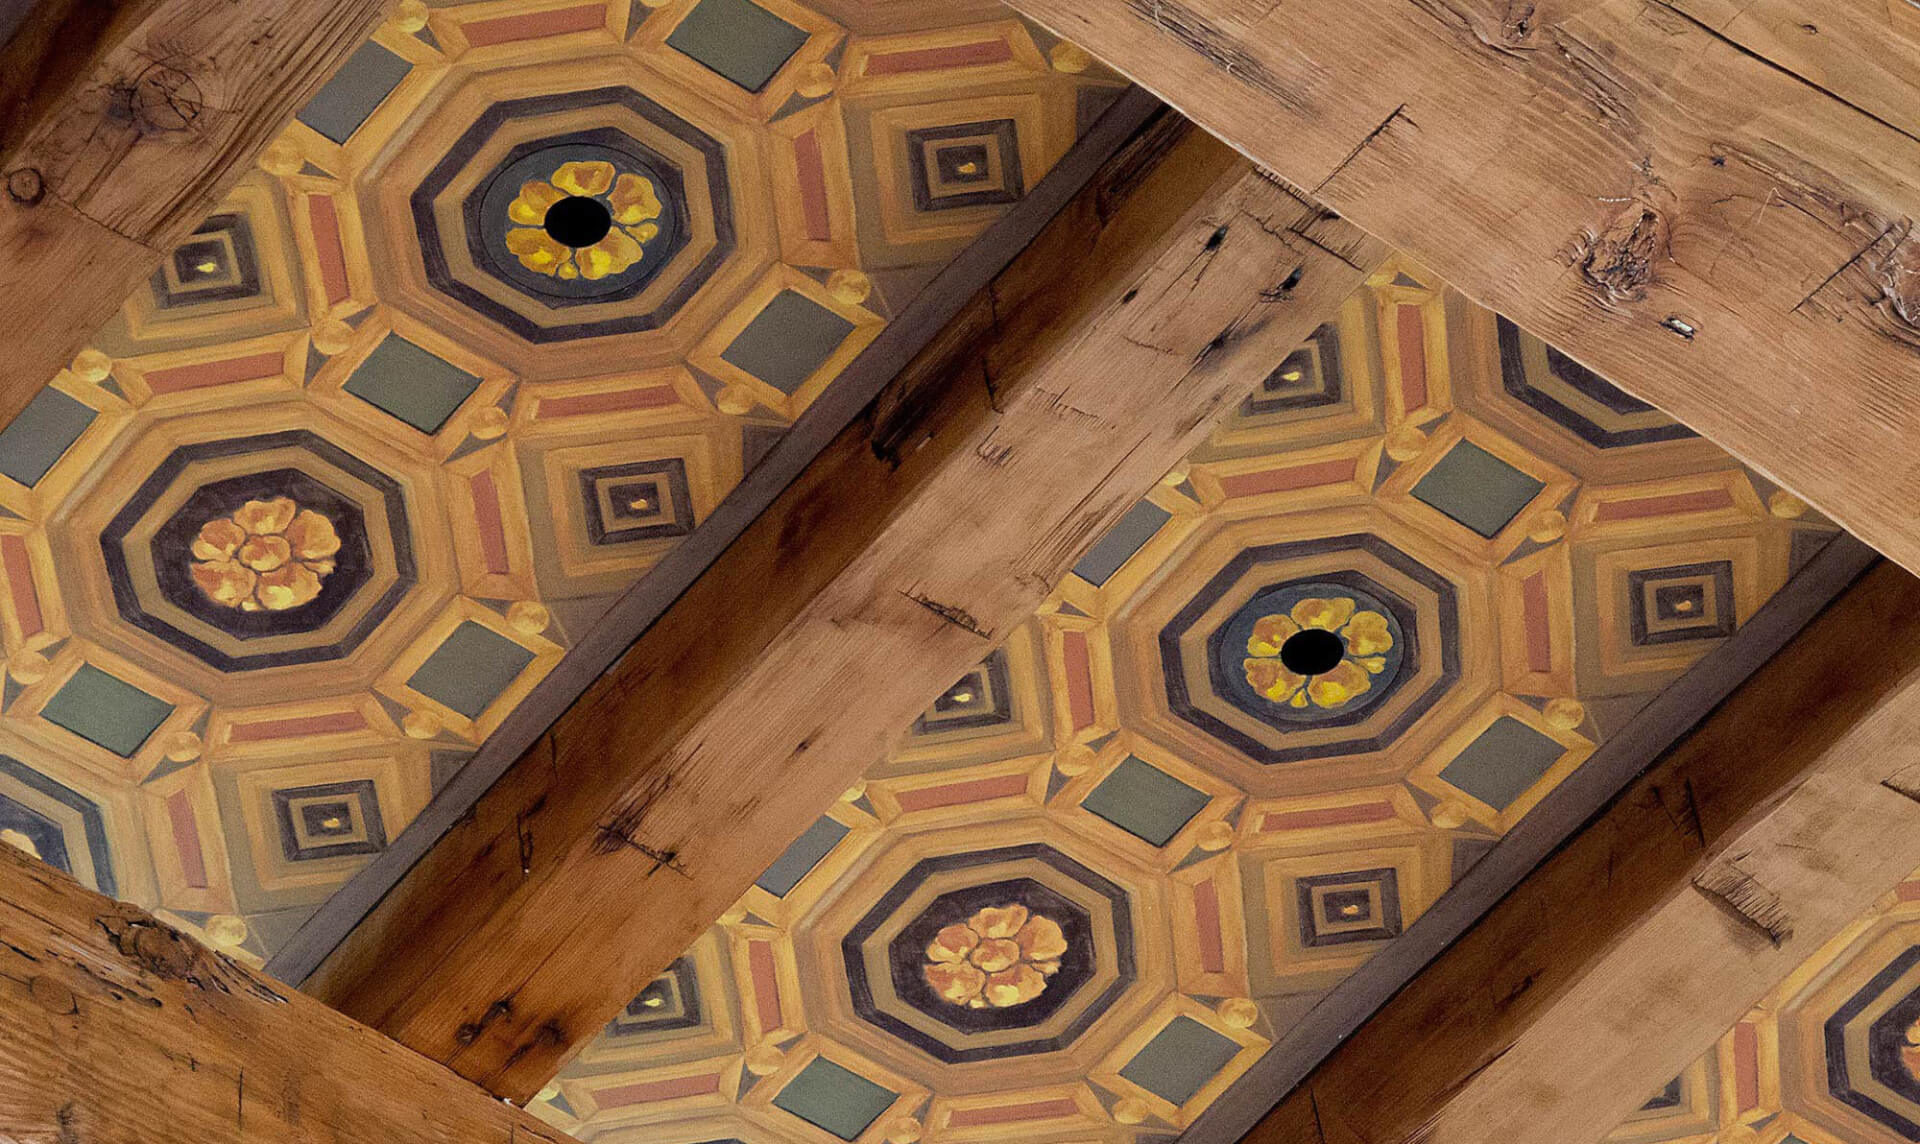 Hand Painted Ceiling Lena Fransioli & Doug Garrabrants